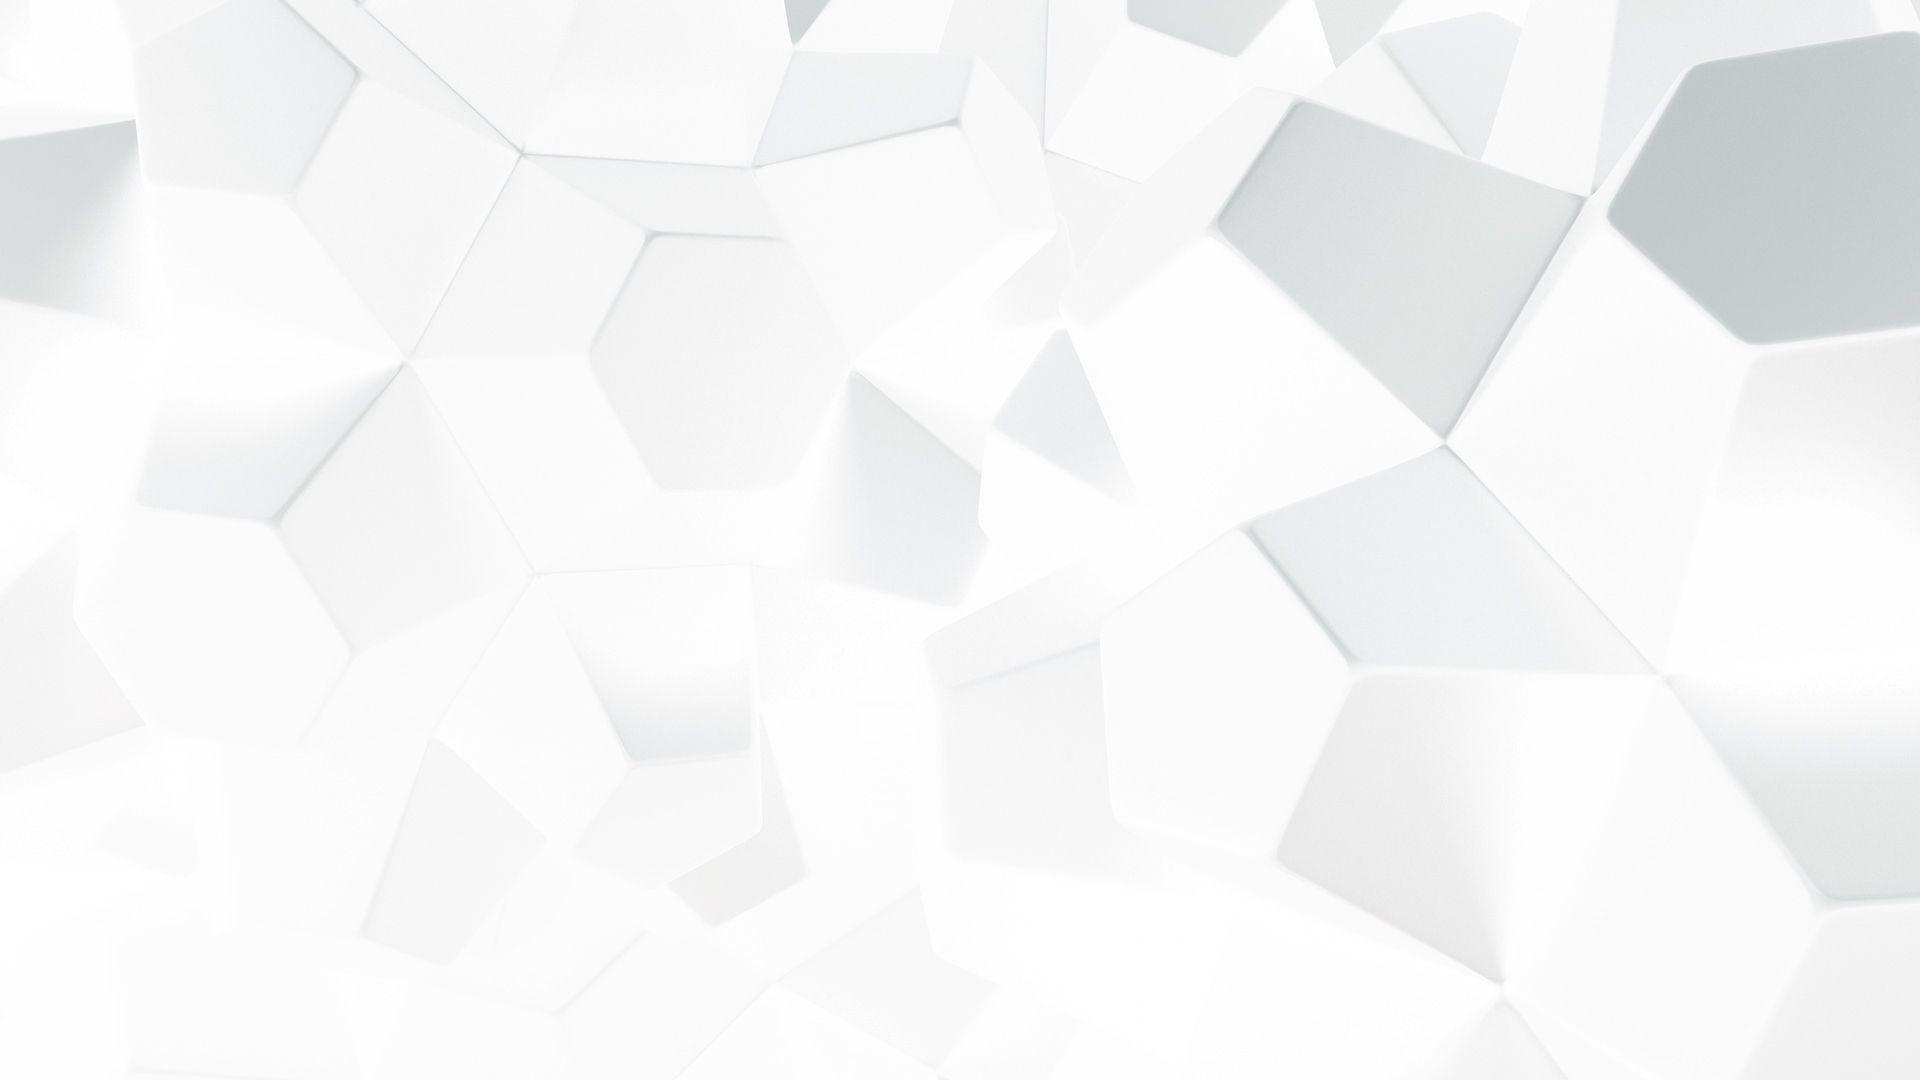 Plain White Wallpaper Hd 1080p - Awesome Wallpapers